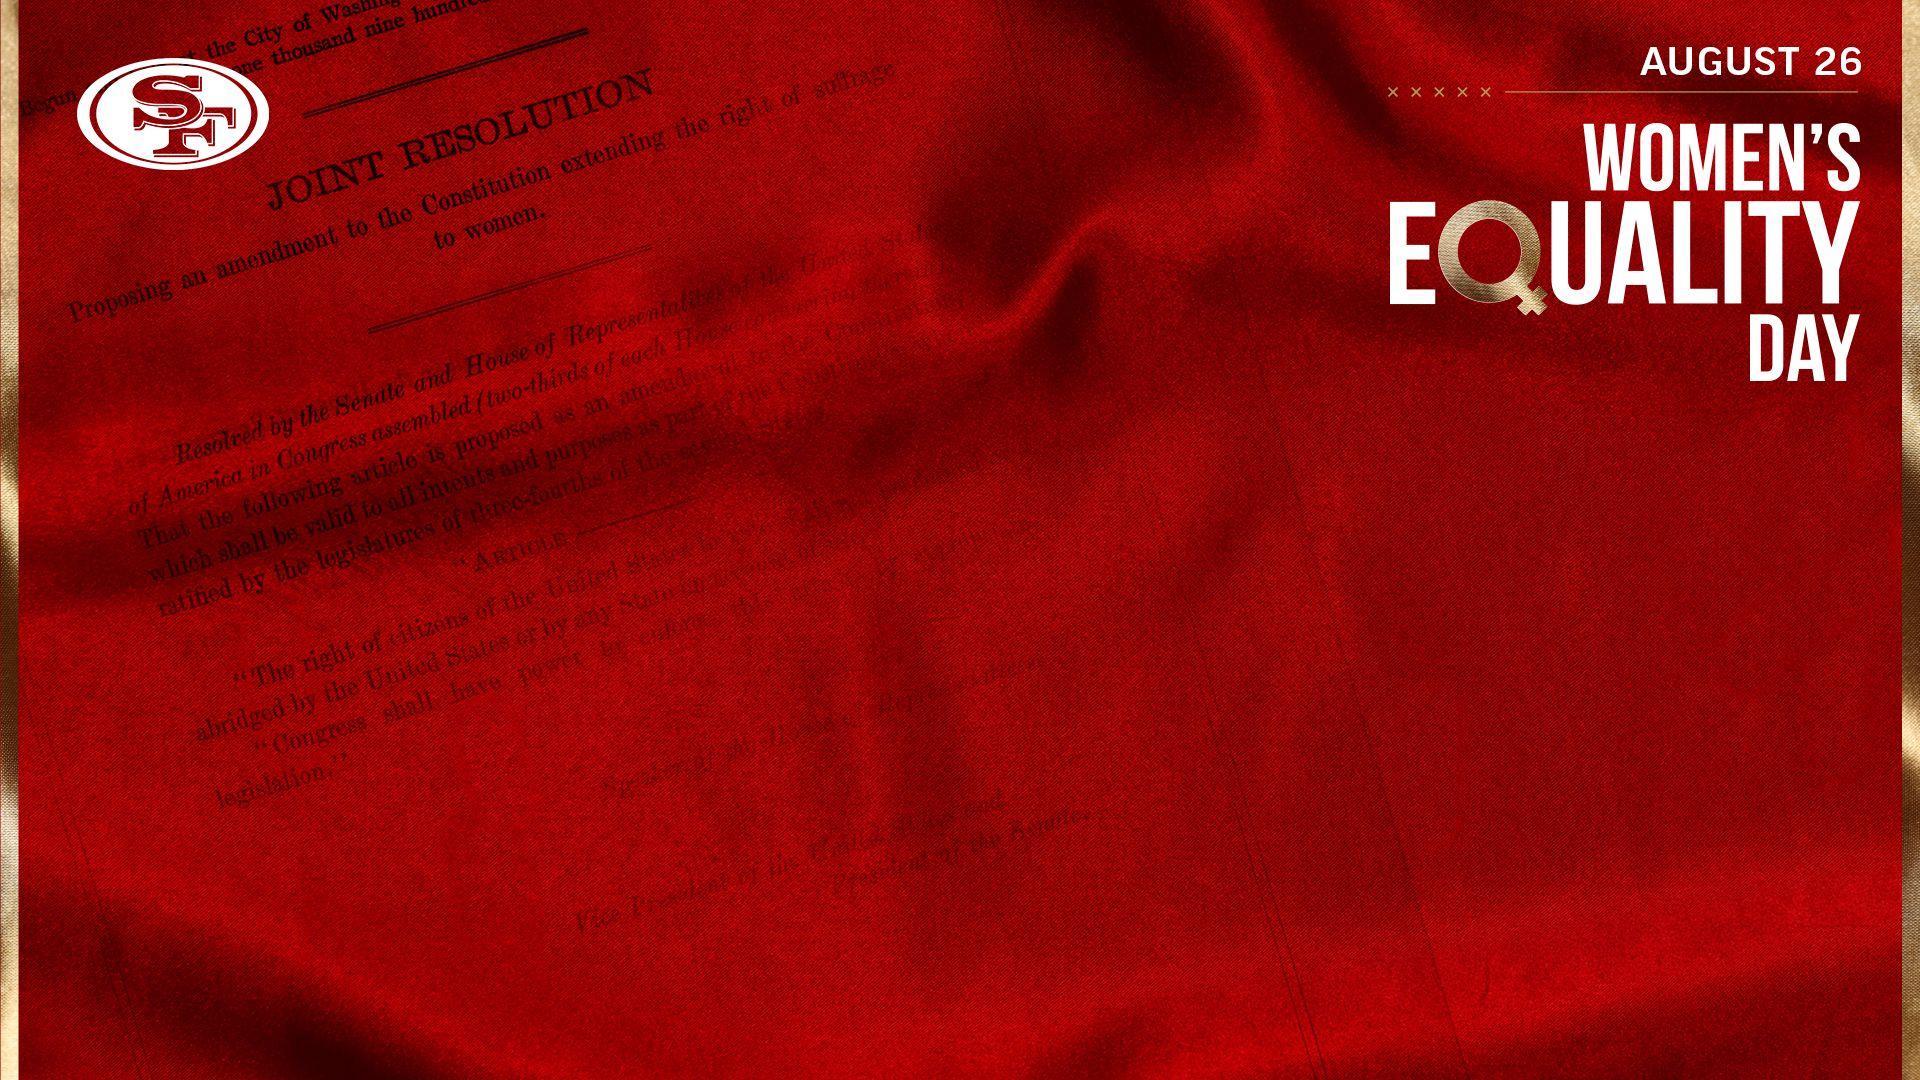 WomensEqualityDay-VirtualBackground-49ers-3